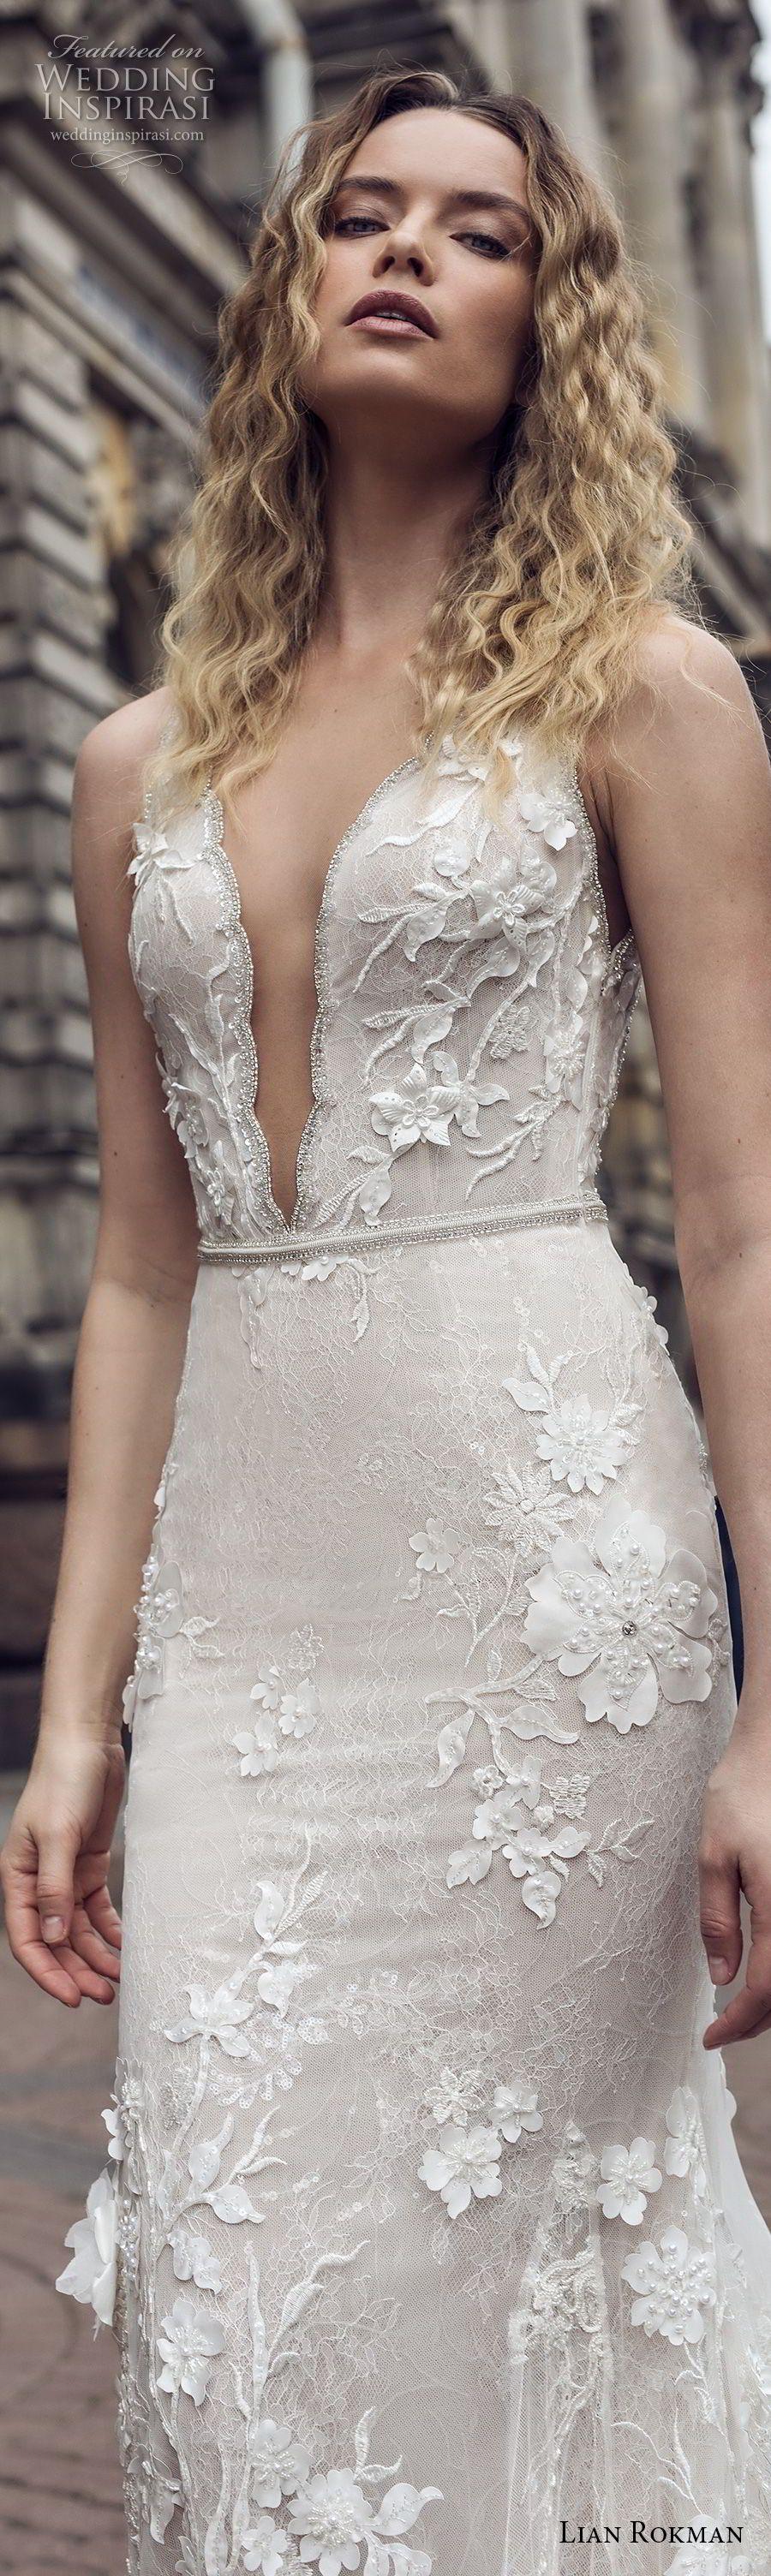 Lian rokman wedding dresses u ucstardustud bridal collection